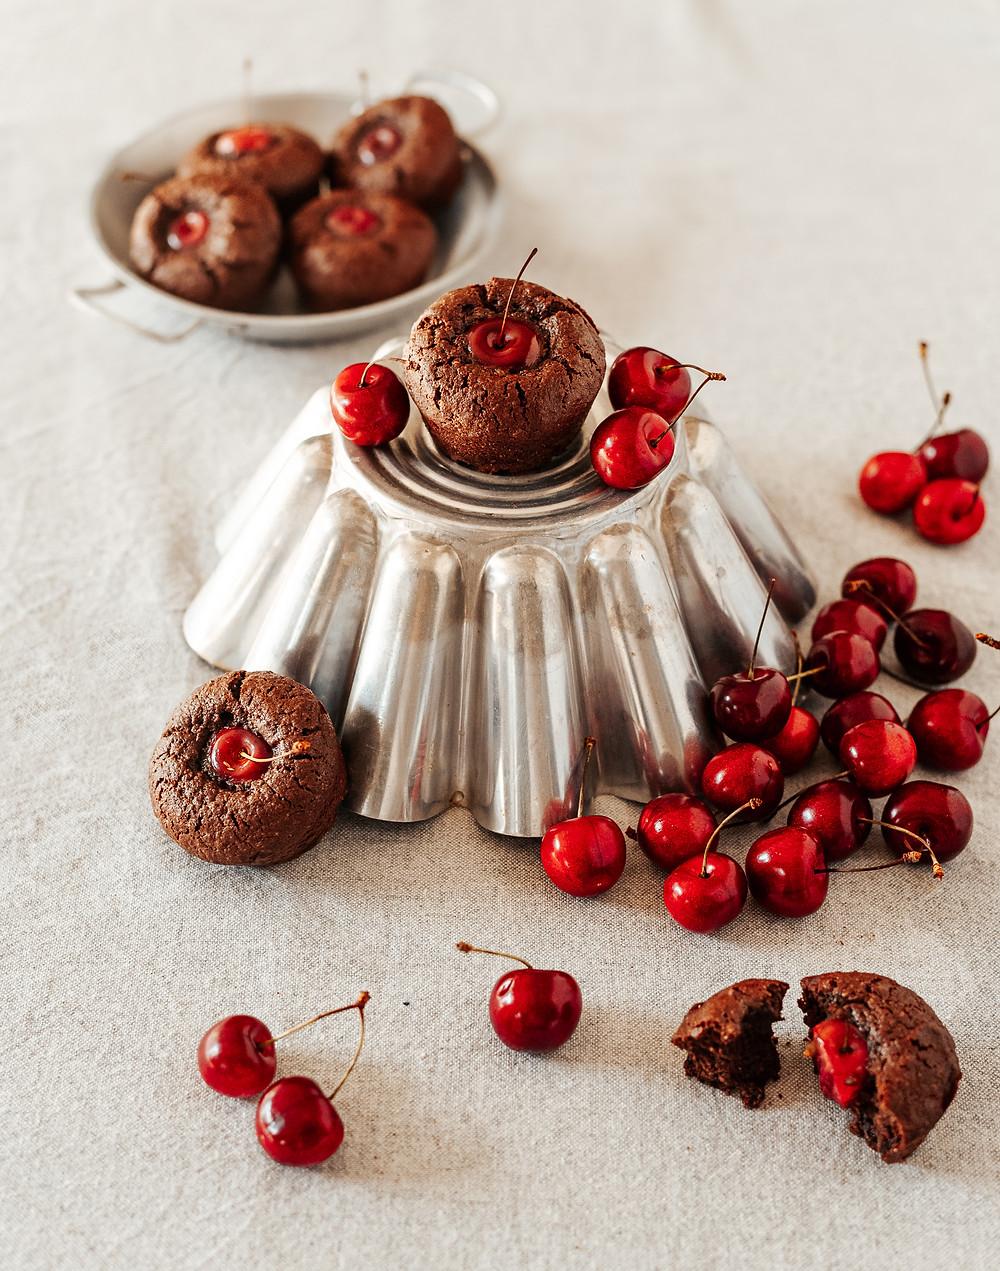 Moelleux chocolat cerise Cook'licot